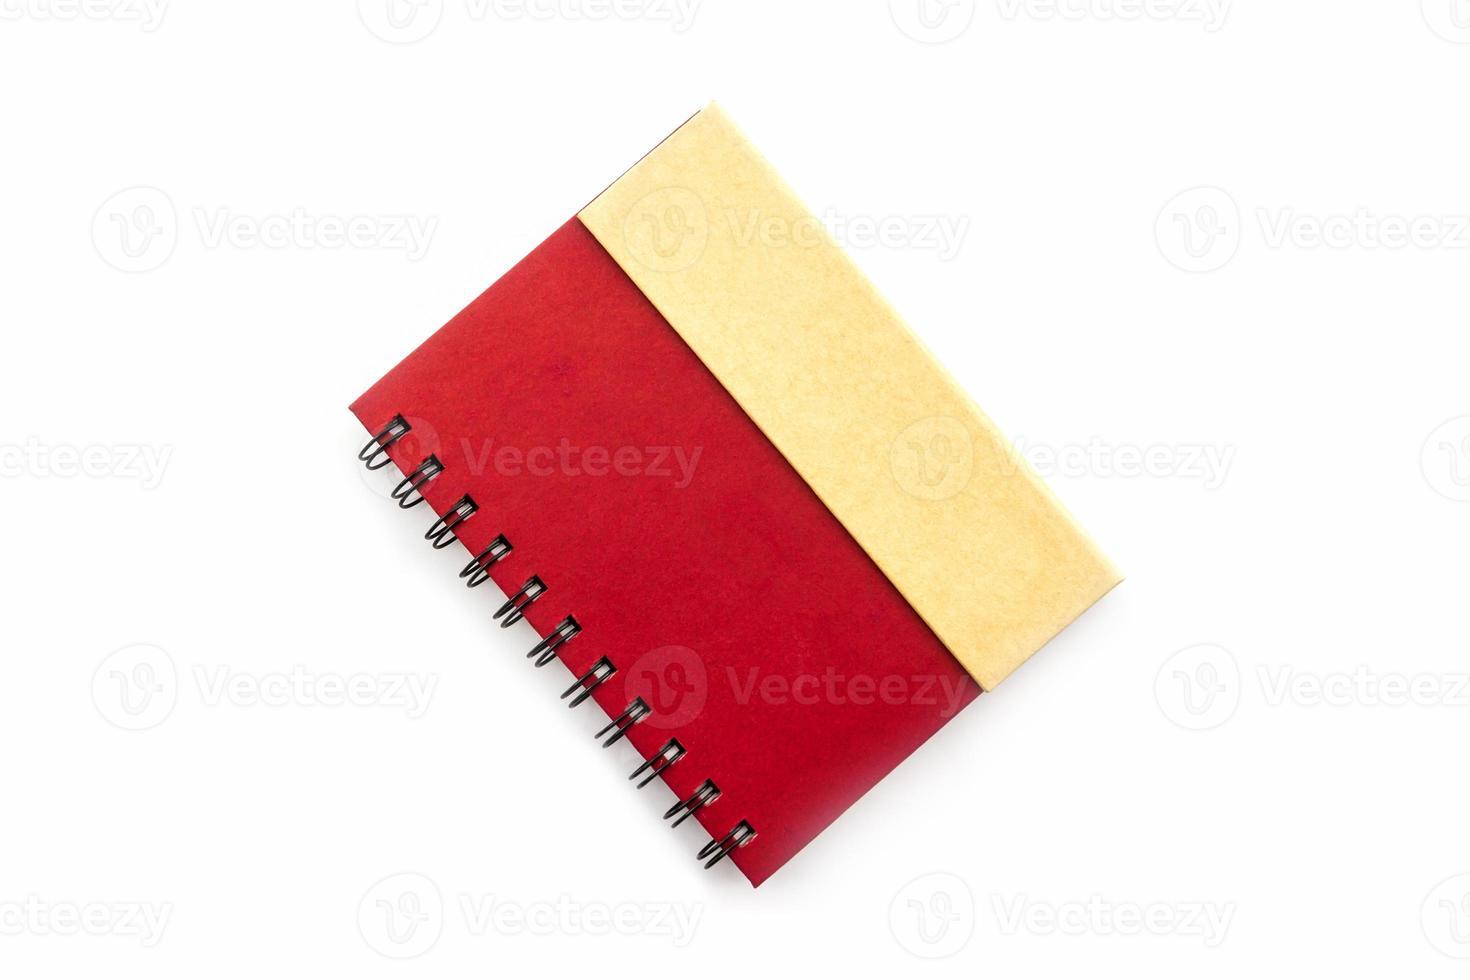 Libro diario rojo sobre fondo blanco. foto